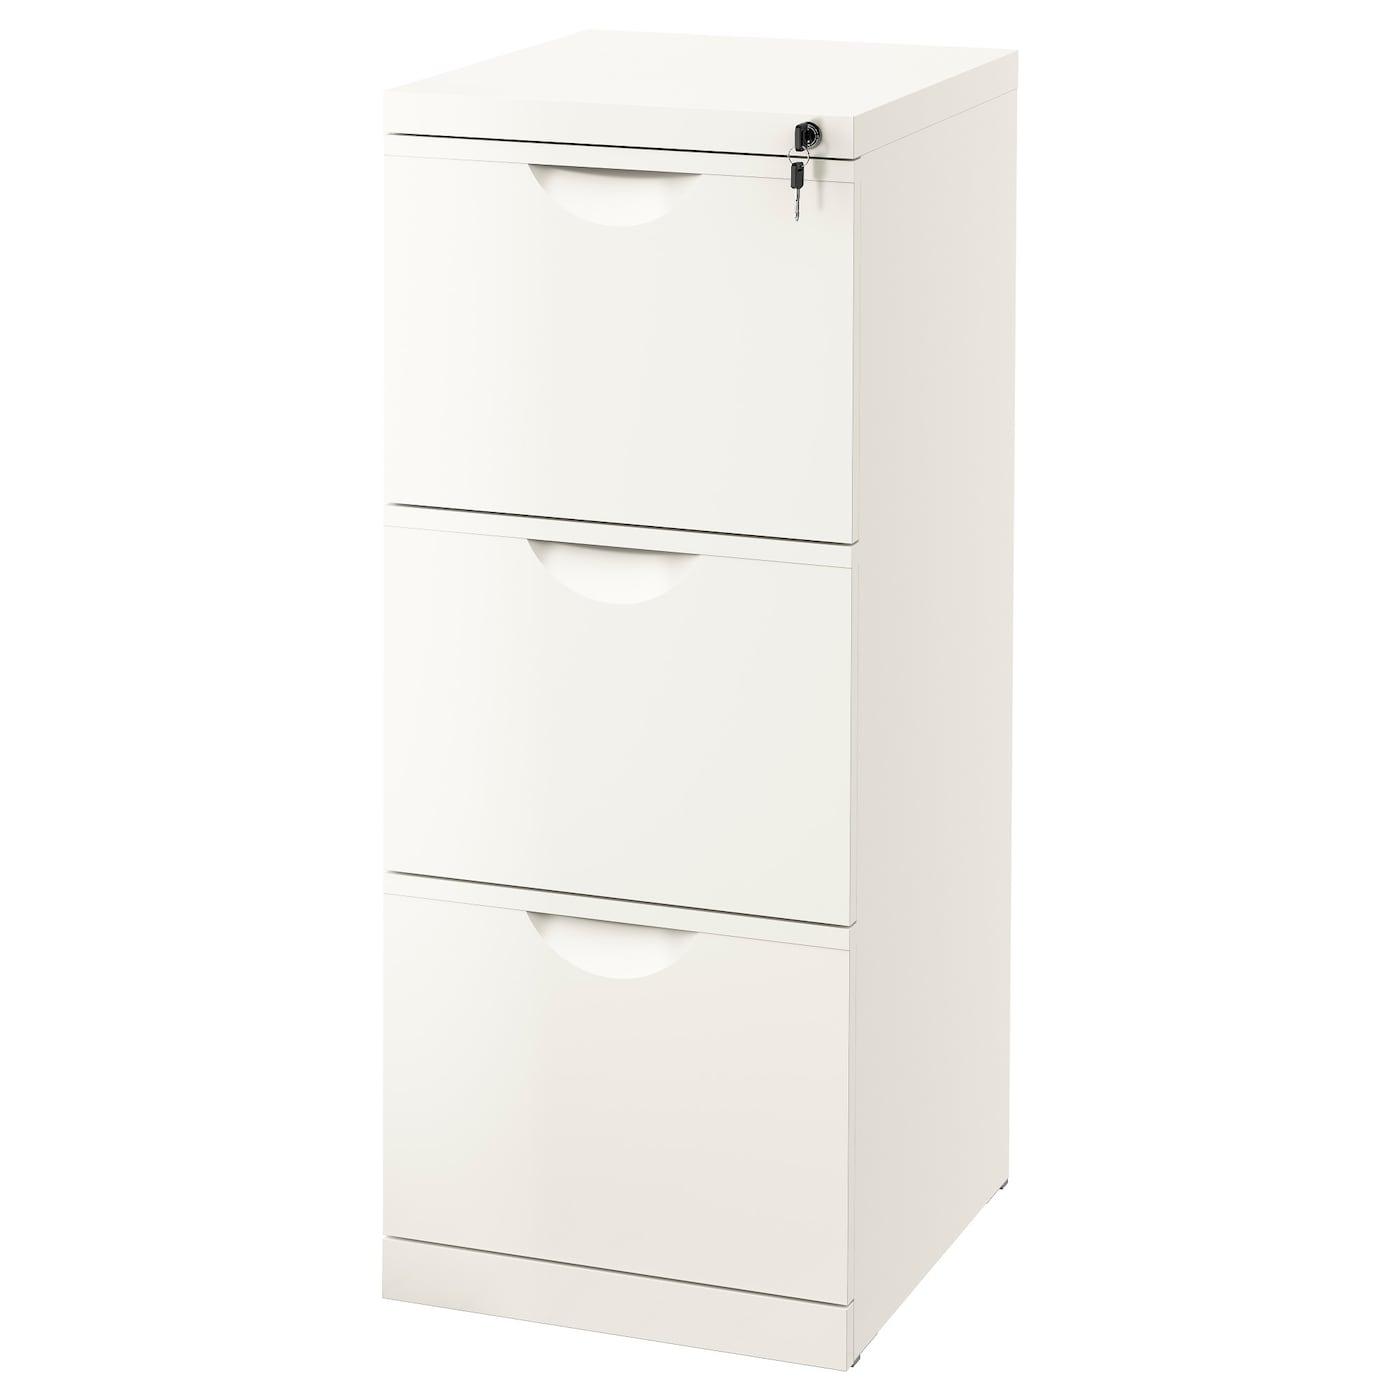 Erik File Cabinet White 16 1 8x41 Ikea